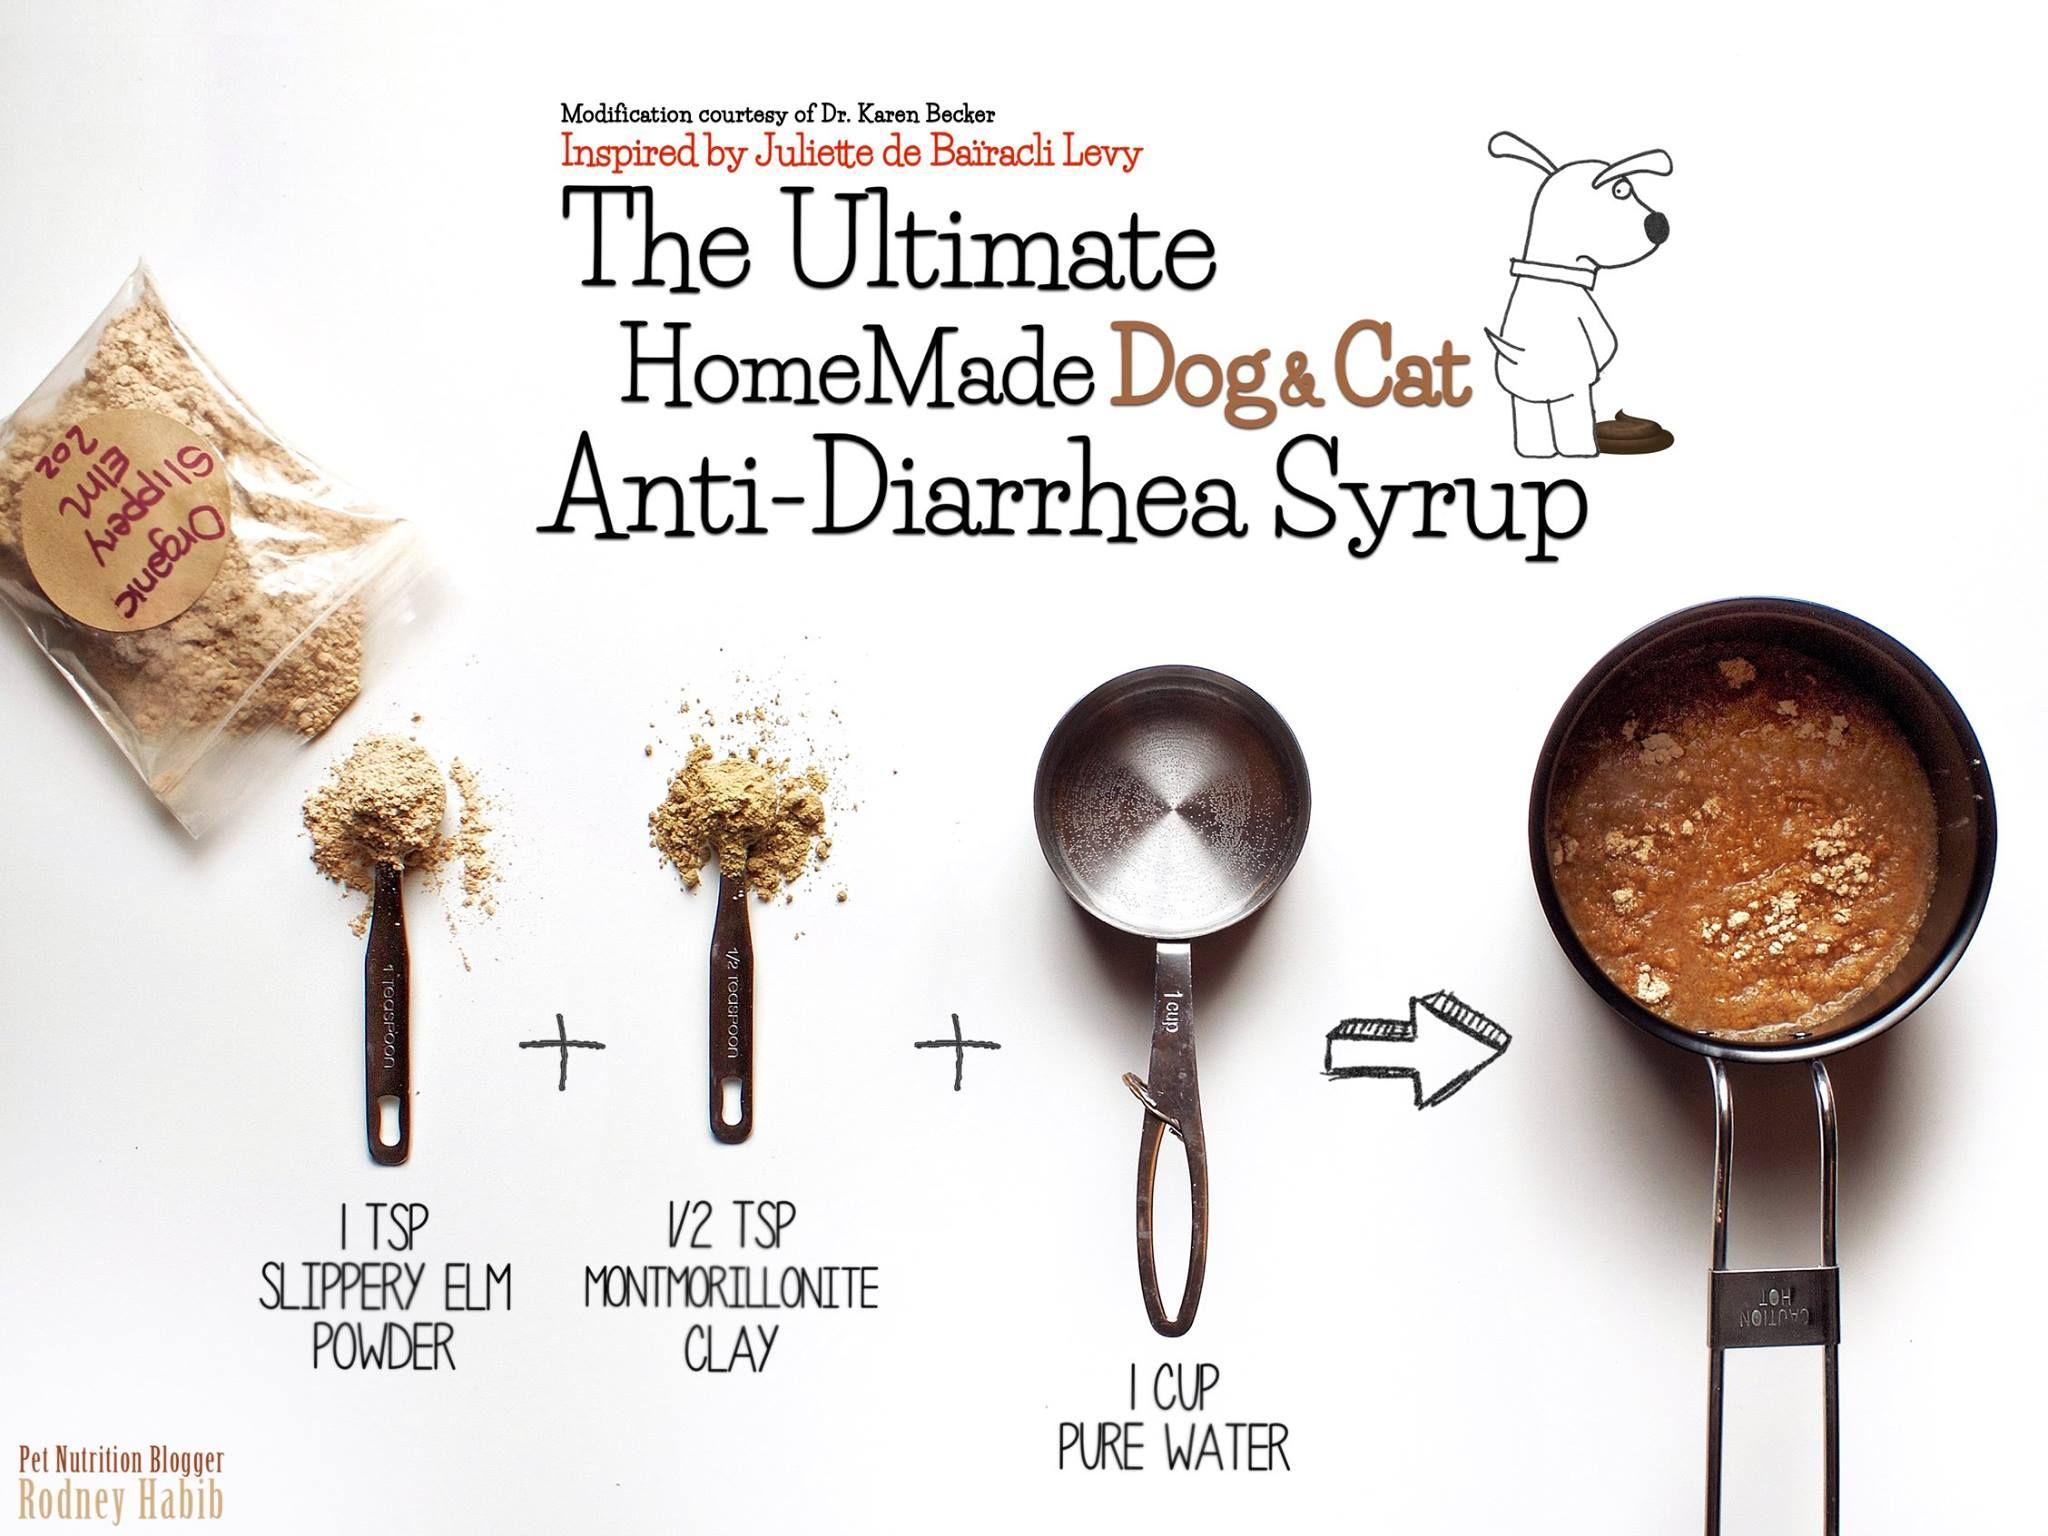 THE HOMEMADE DOG & CAT ANTIDIARRHEA RECIPE Unfortunately